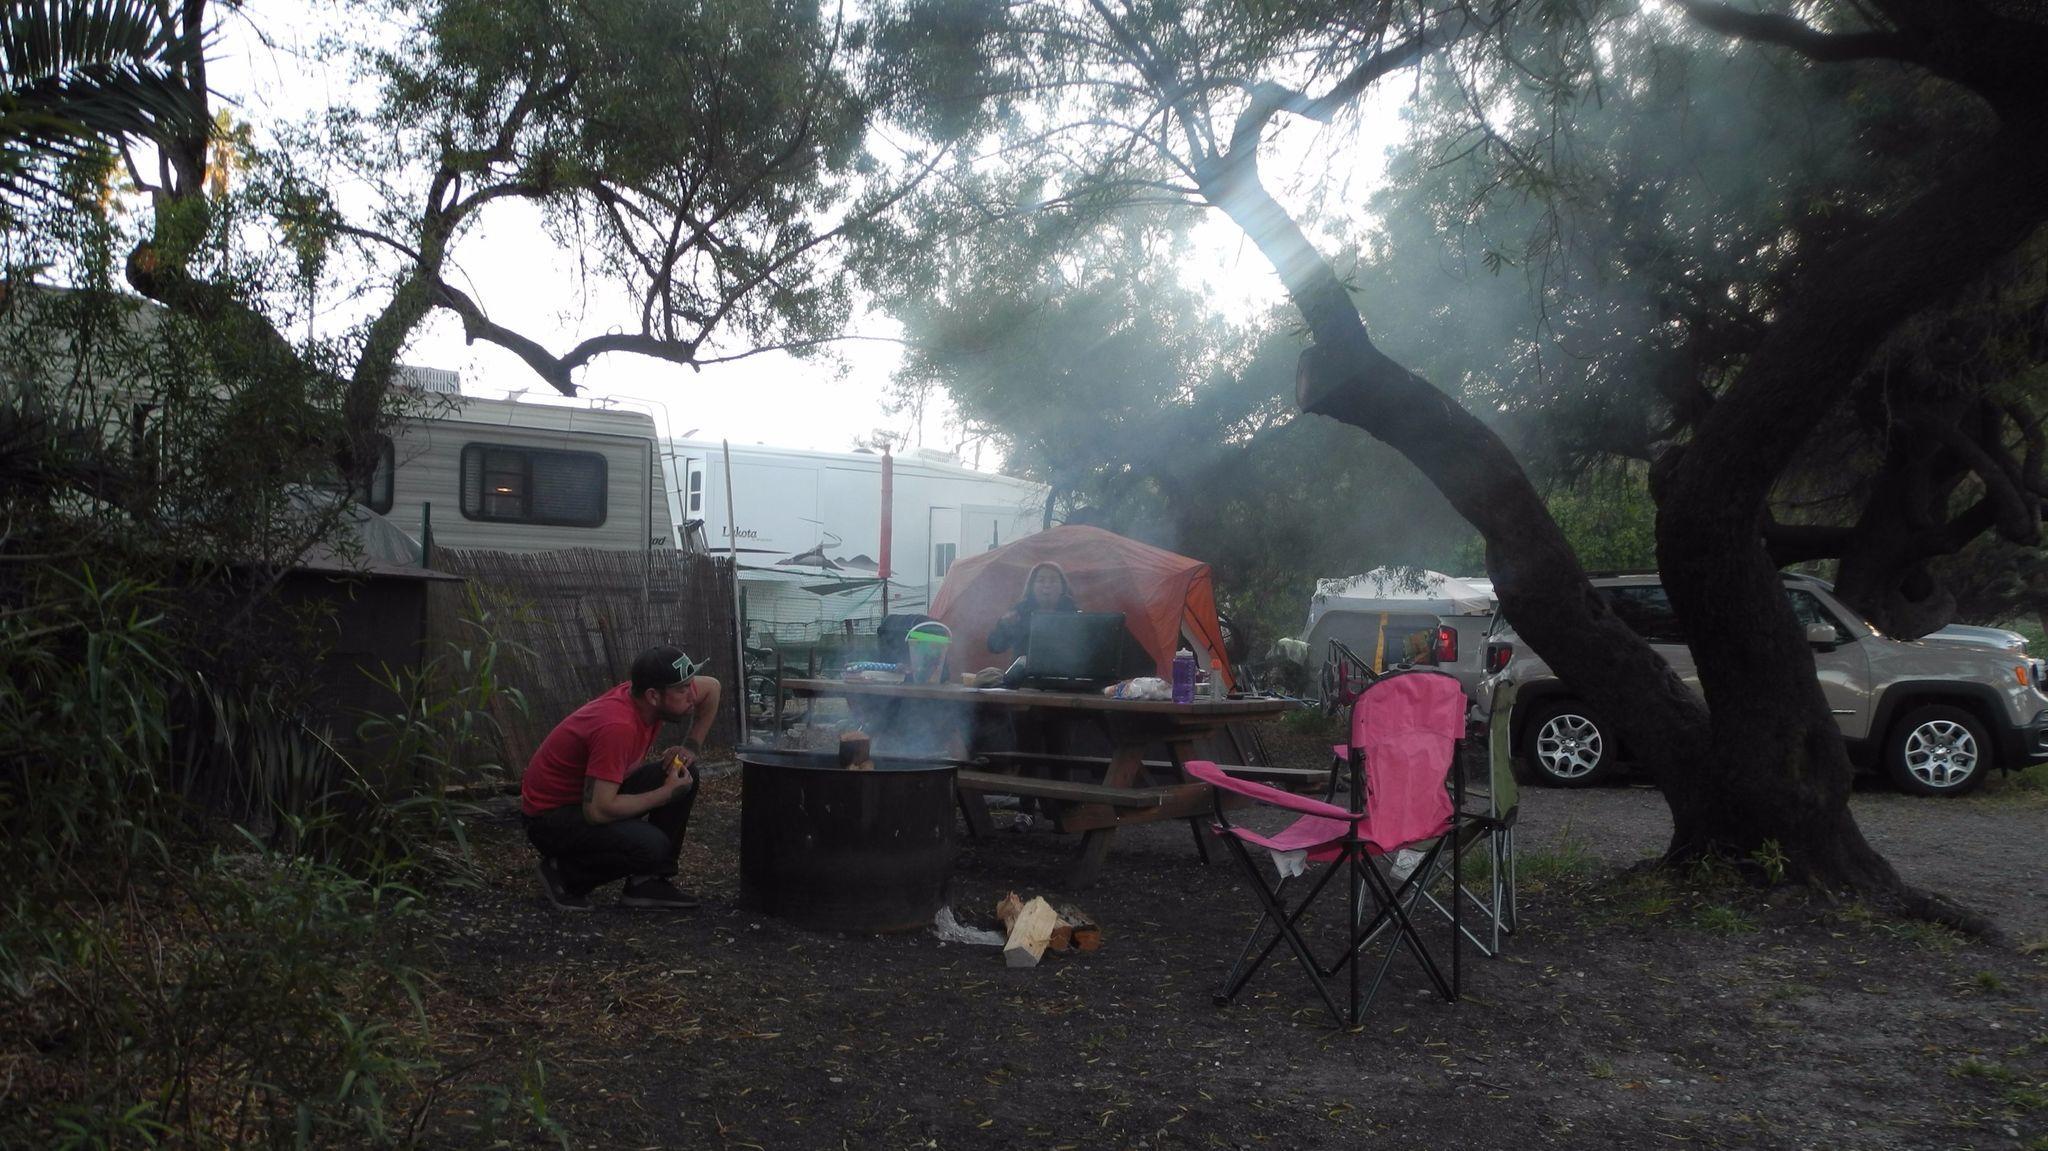 Elyie Florez blows into the fire in Refugio State Beach campsite while writer Denise Florez prepares the stove to sauté vegetables, May 20, 2017.